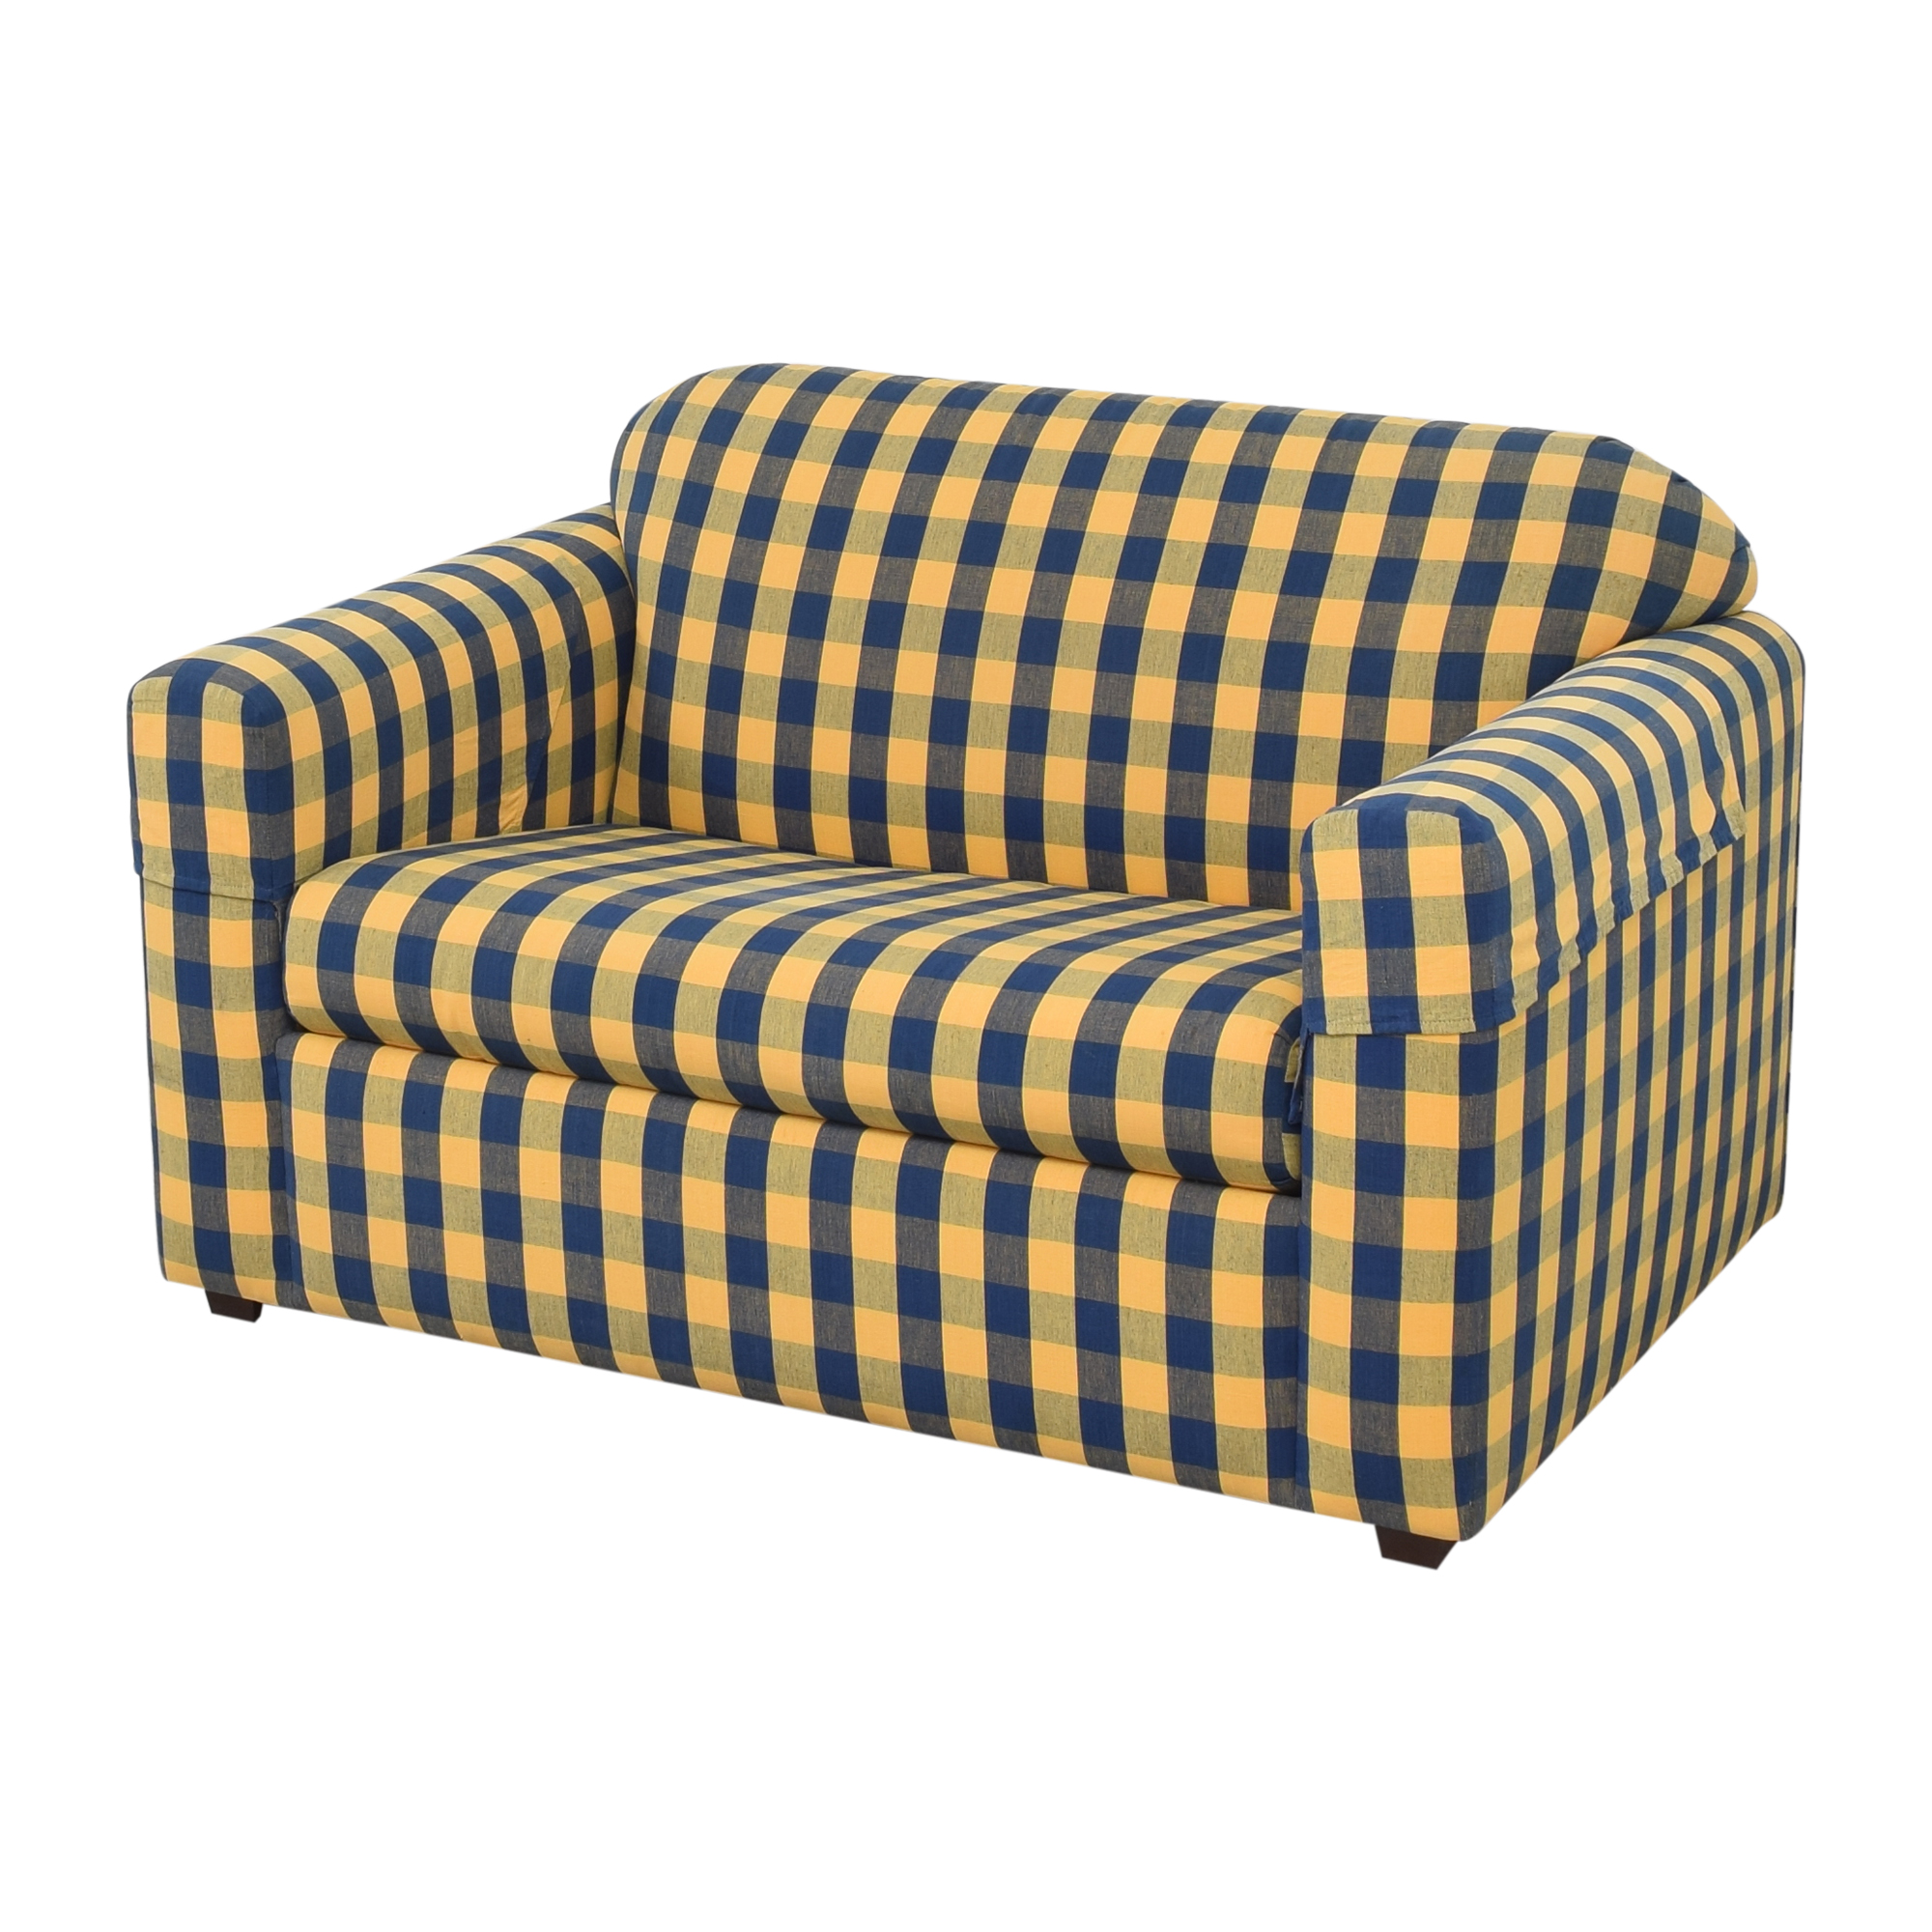 Flexsteel Flexsteel Sleephaven Twin Sleeper Sofa dimensions